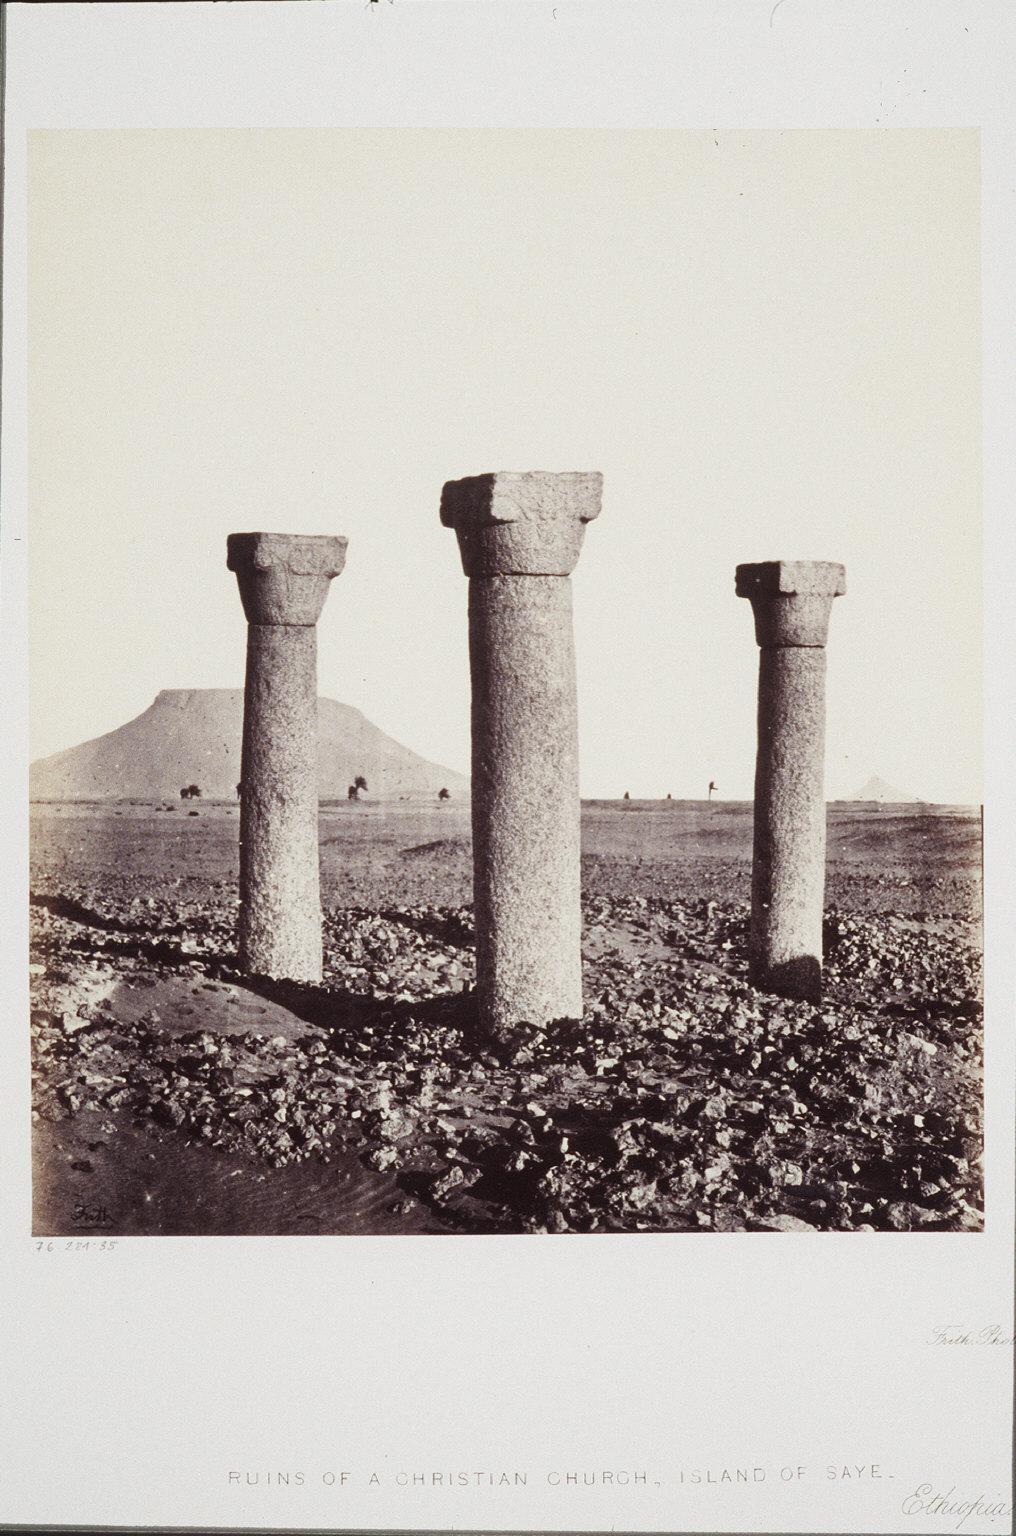 Ruins of a Chritstian Church, Island of Saye